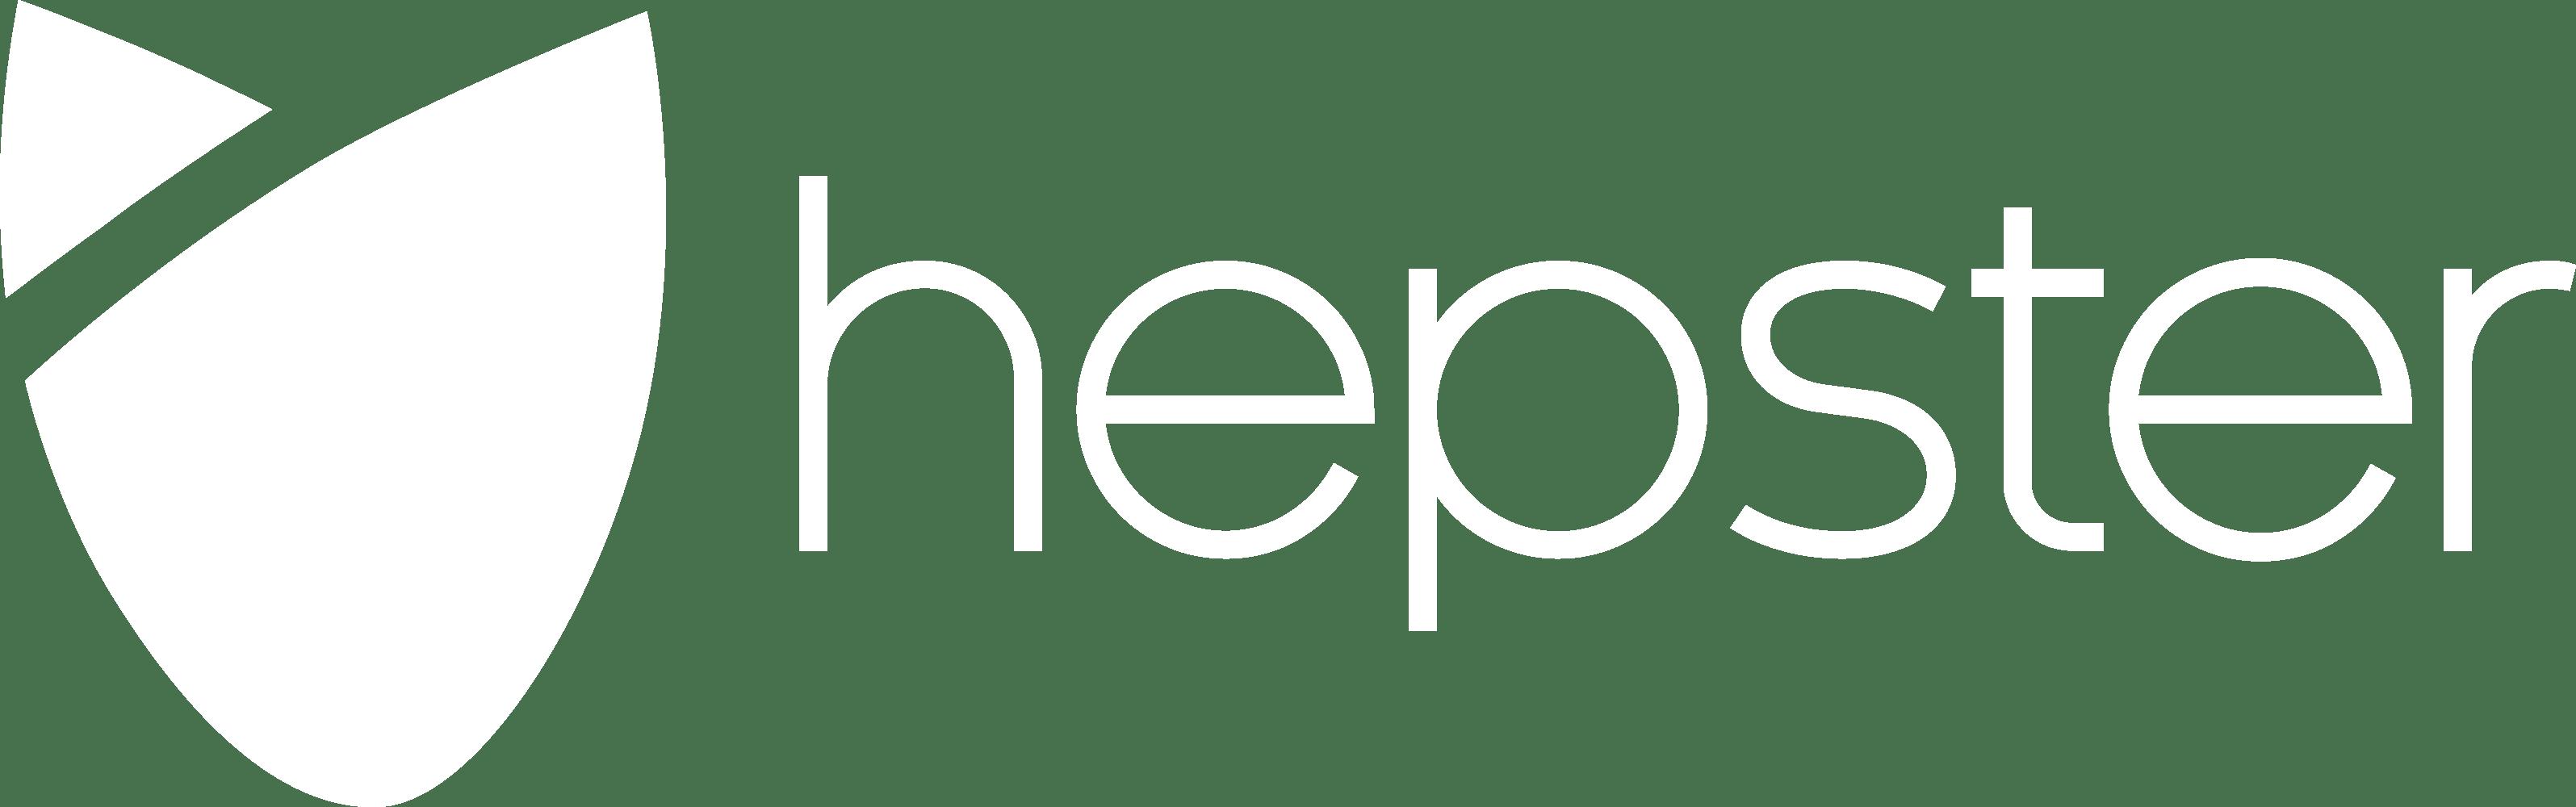 Logo hepster weiß